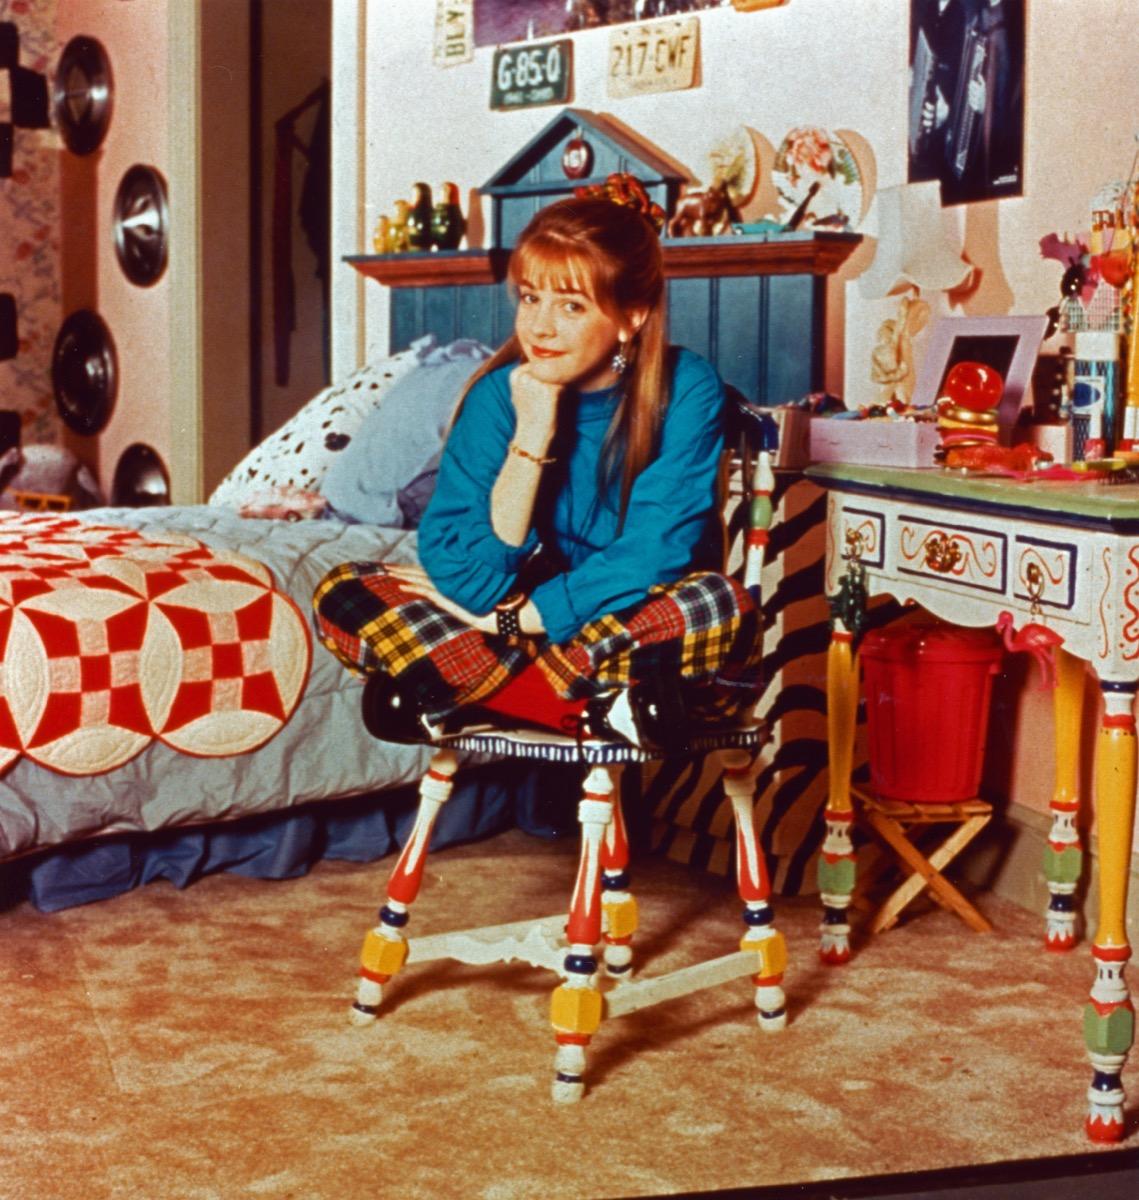 Melissa Joan Hart in Clarissa Explains It All